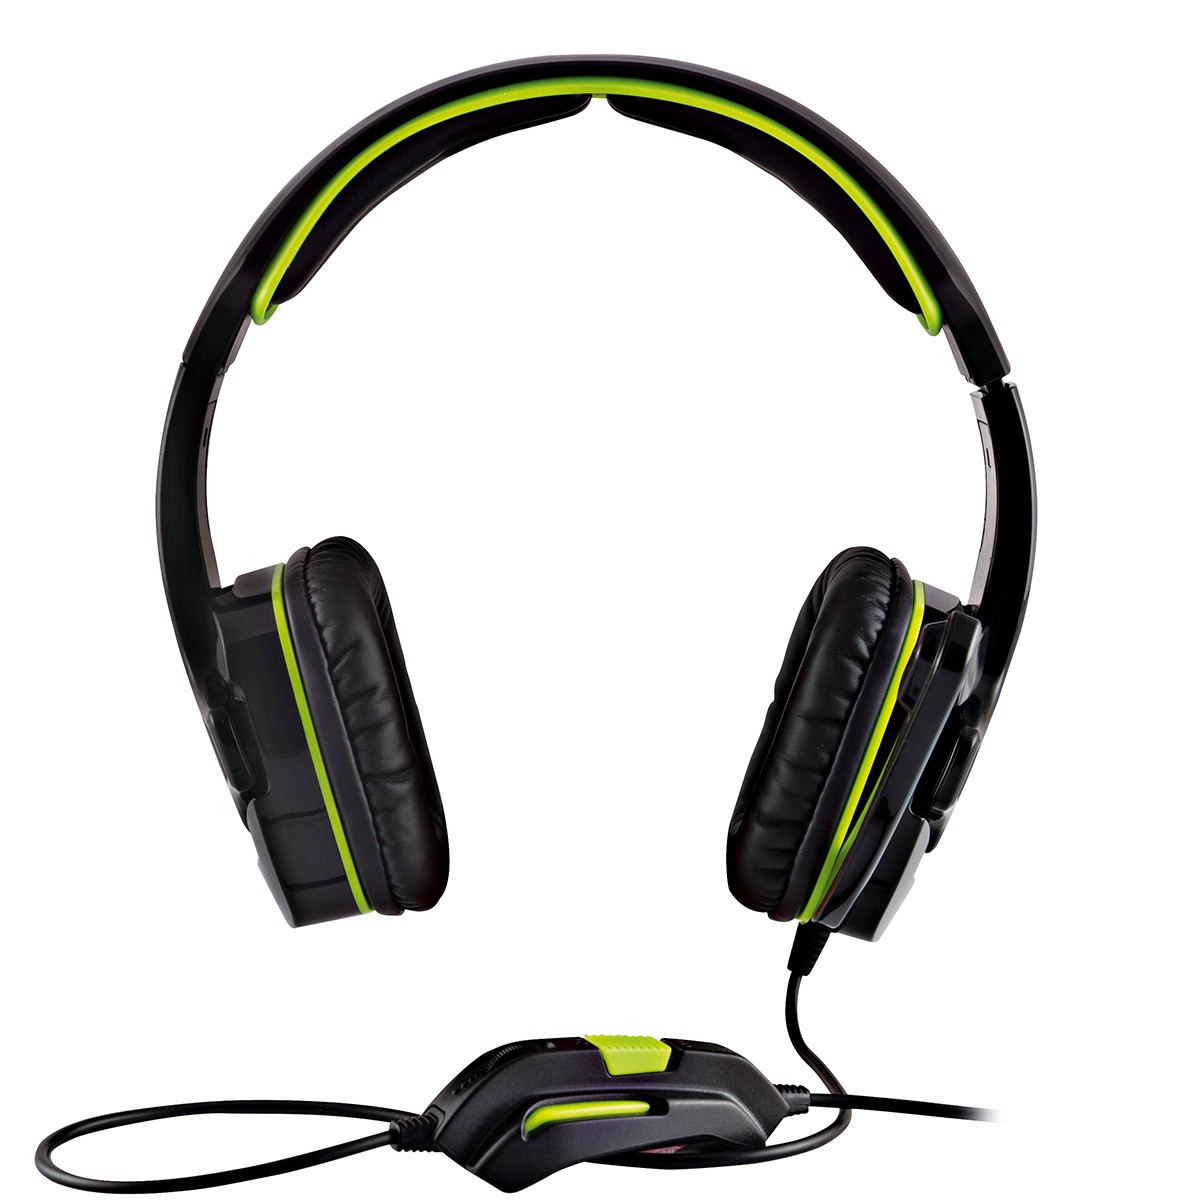 MODECOM ALIEN MC-829 Black/Green gamers headphones